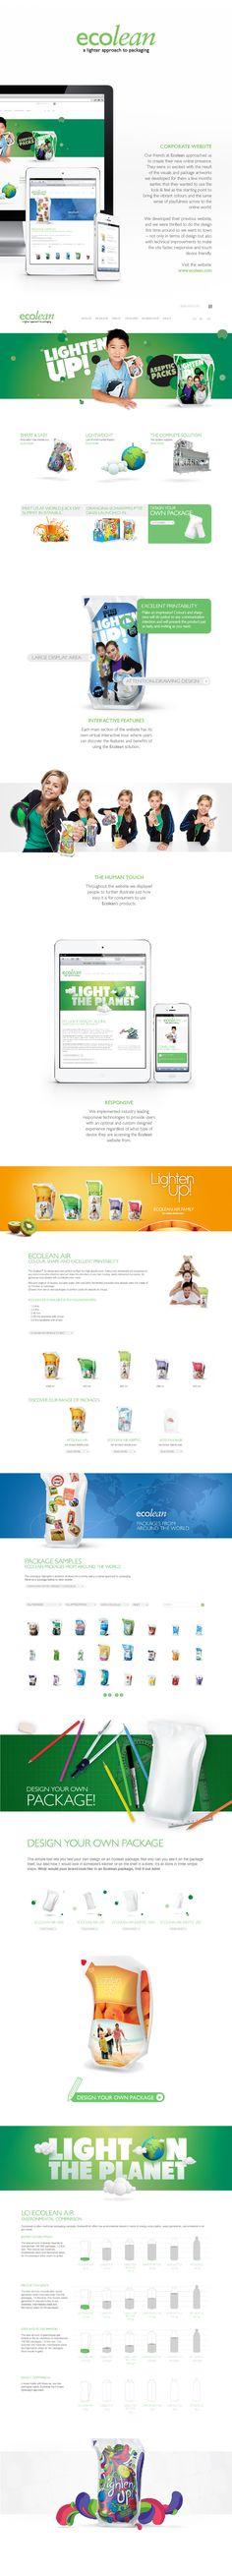 Ecolean website by Binalogue #web #design #webdesign   http://www.behance.net/gallery/Ecolean-website/11064643